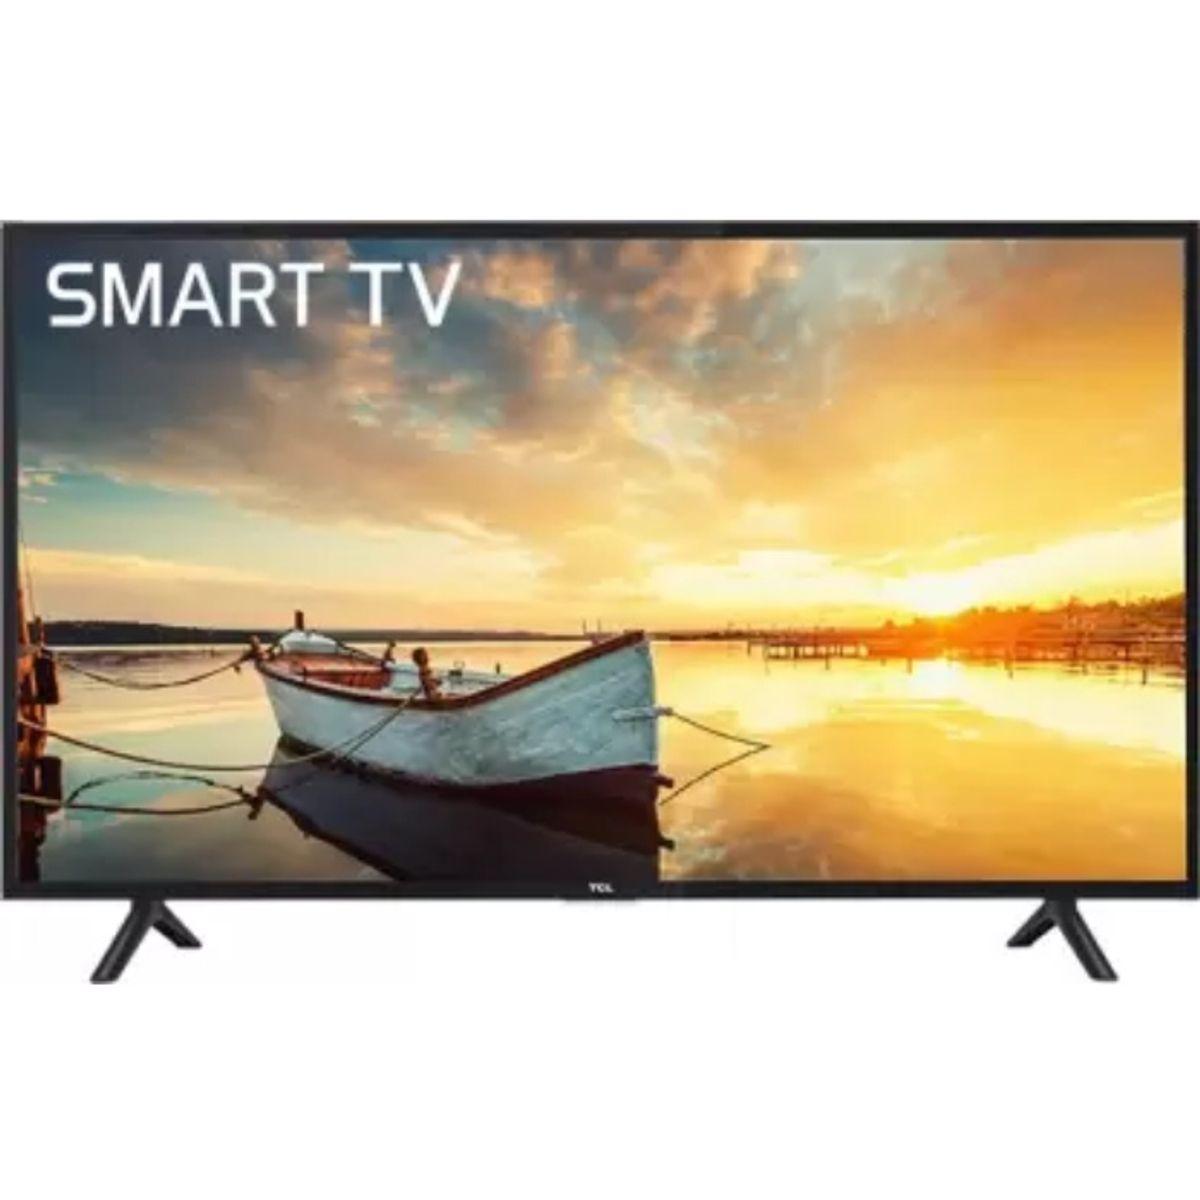 TCL 40 Inches Full HD LED Smart TV (40S62FS)